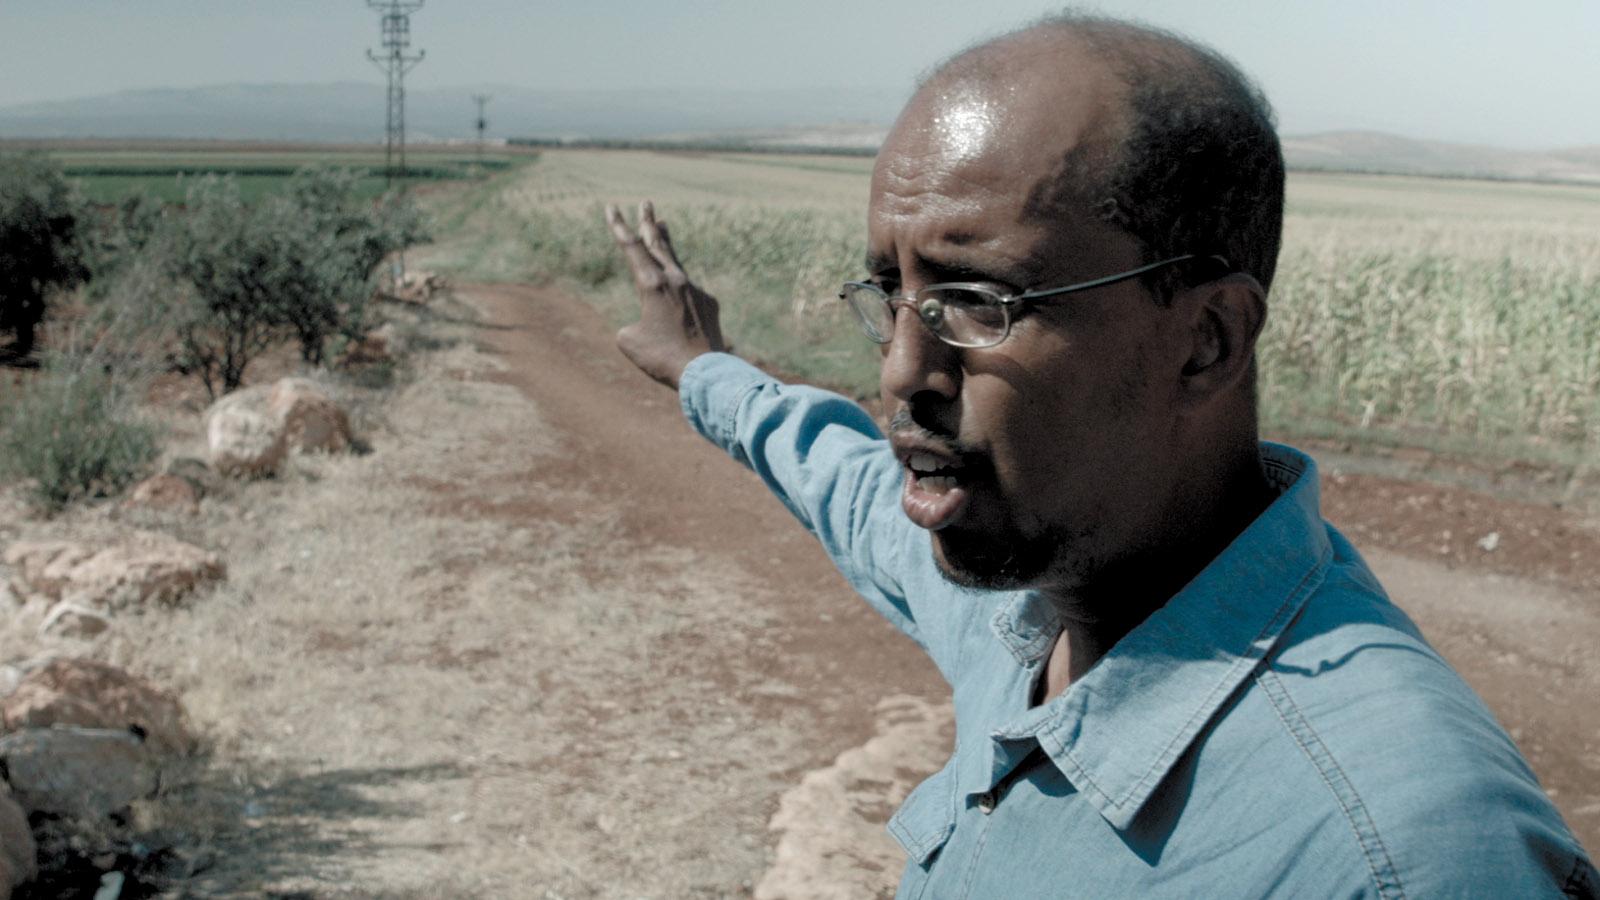 Sadiq Juma in the documentary film Only a Father